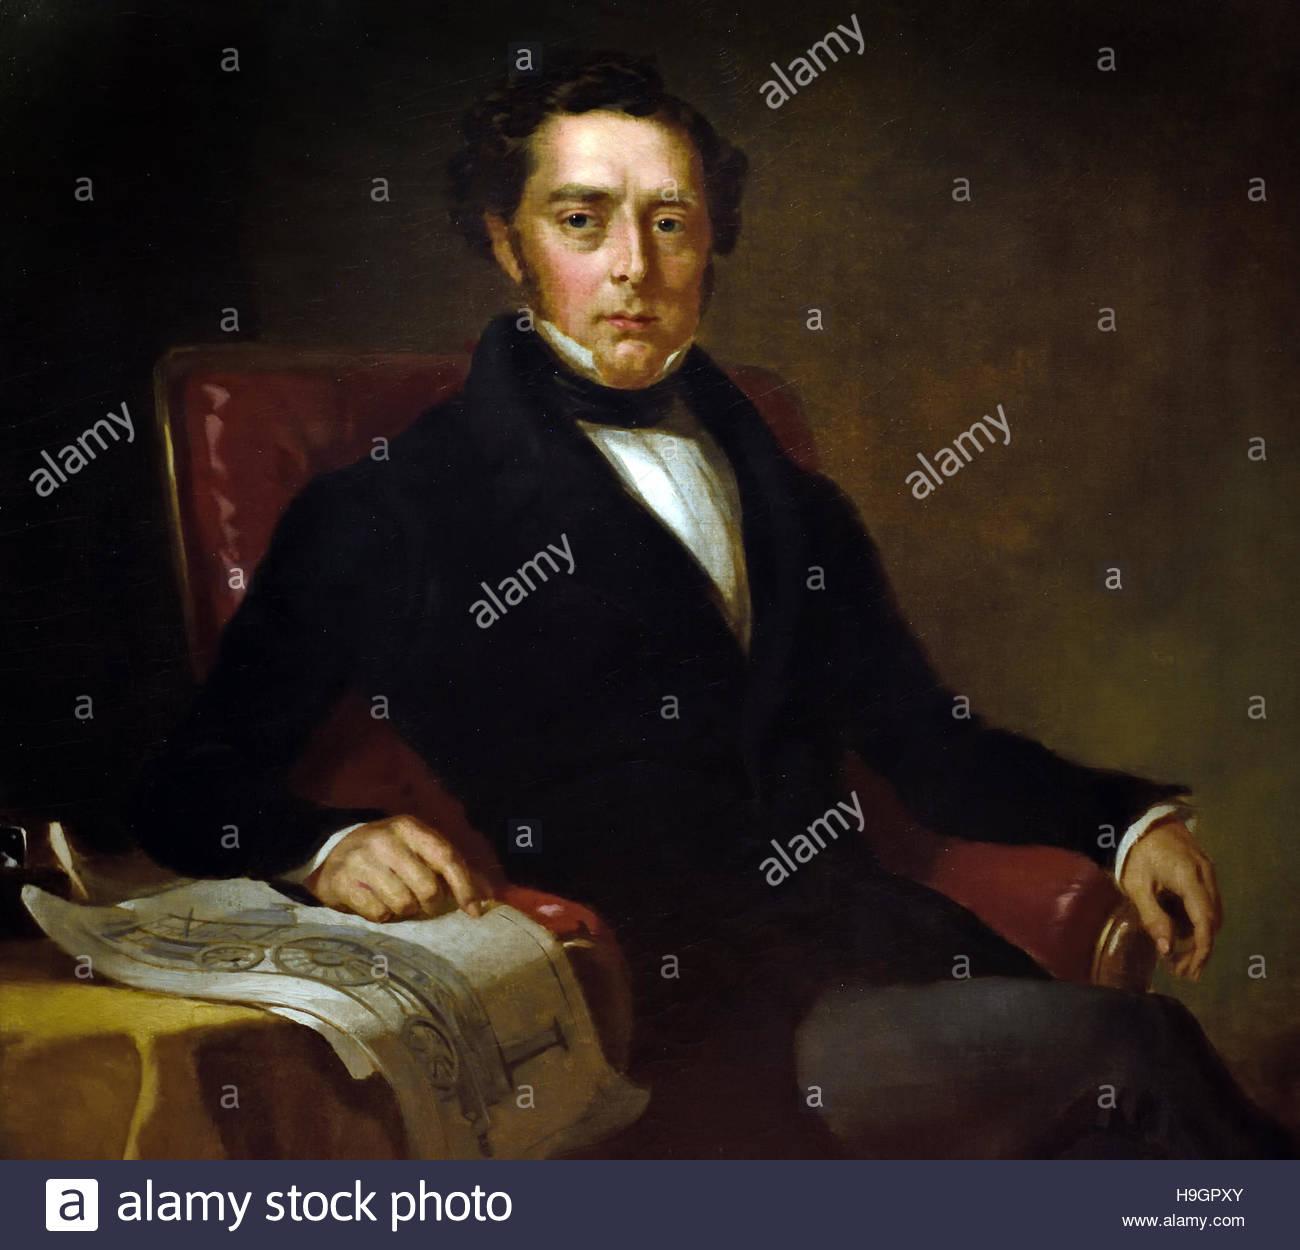 Robert Stephenson 1803 1859 Civil engineer by John Lucas Stock